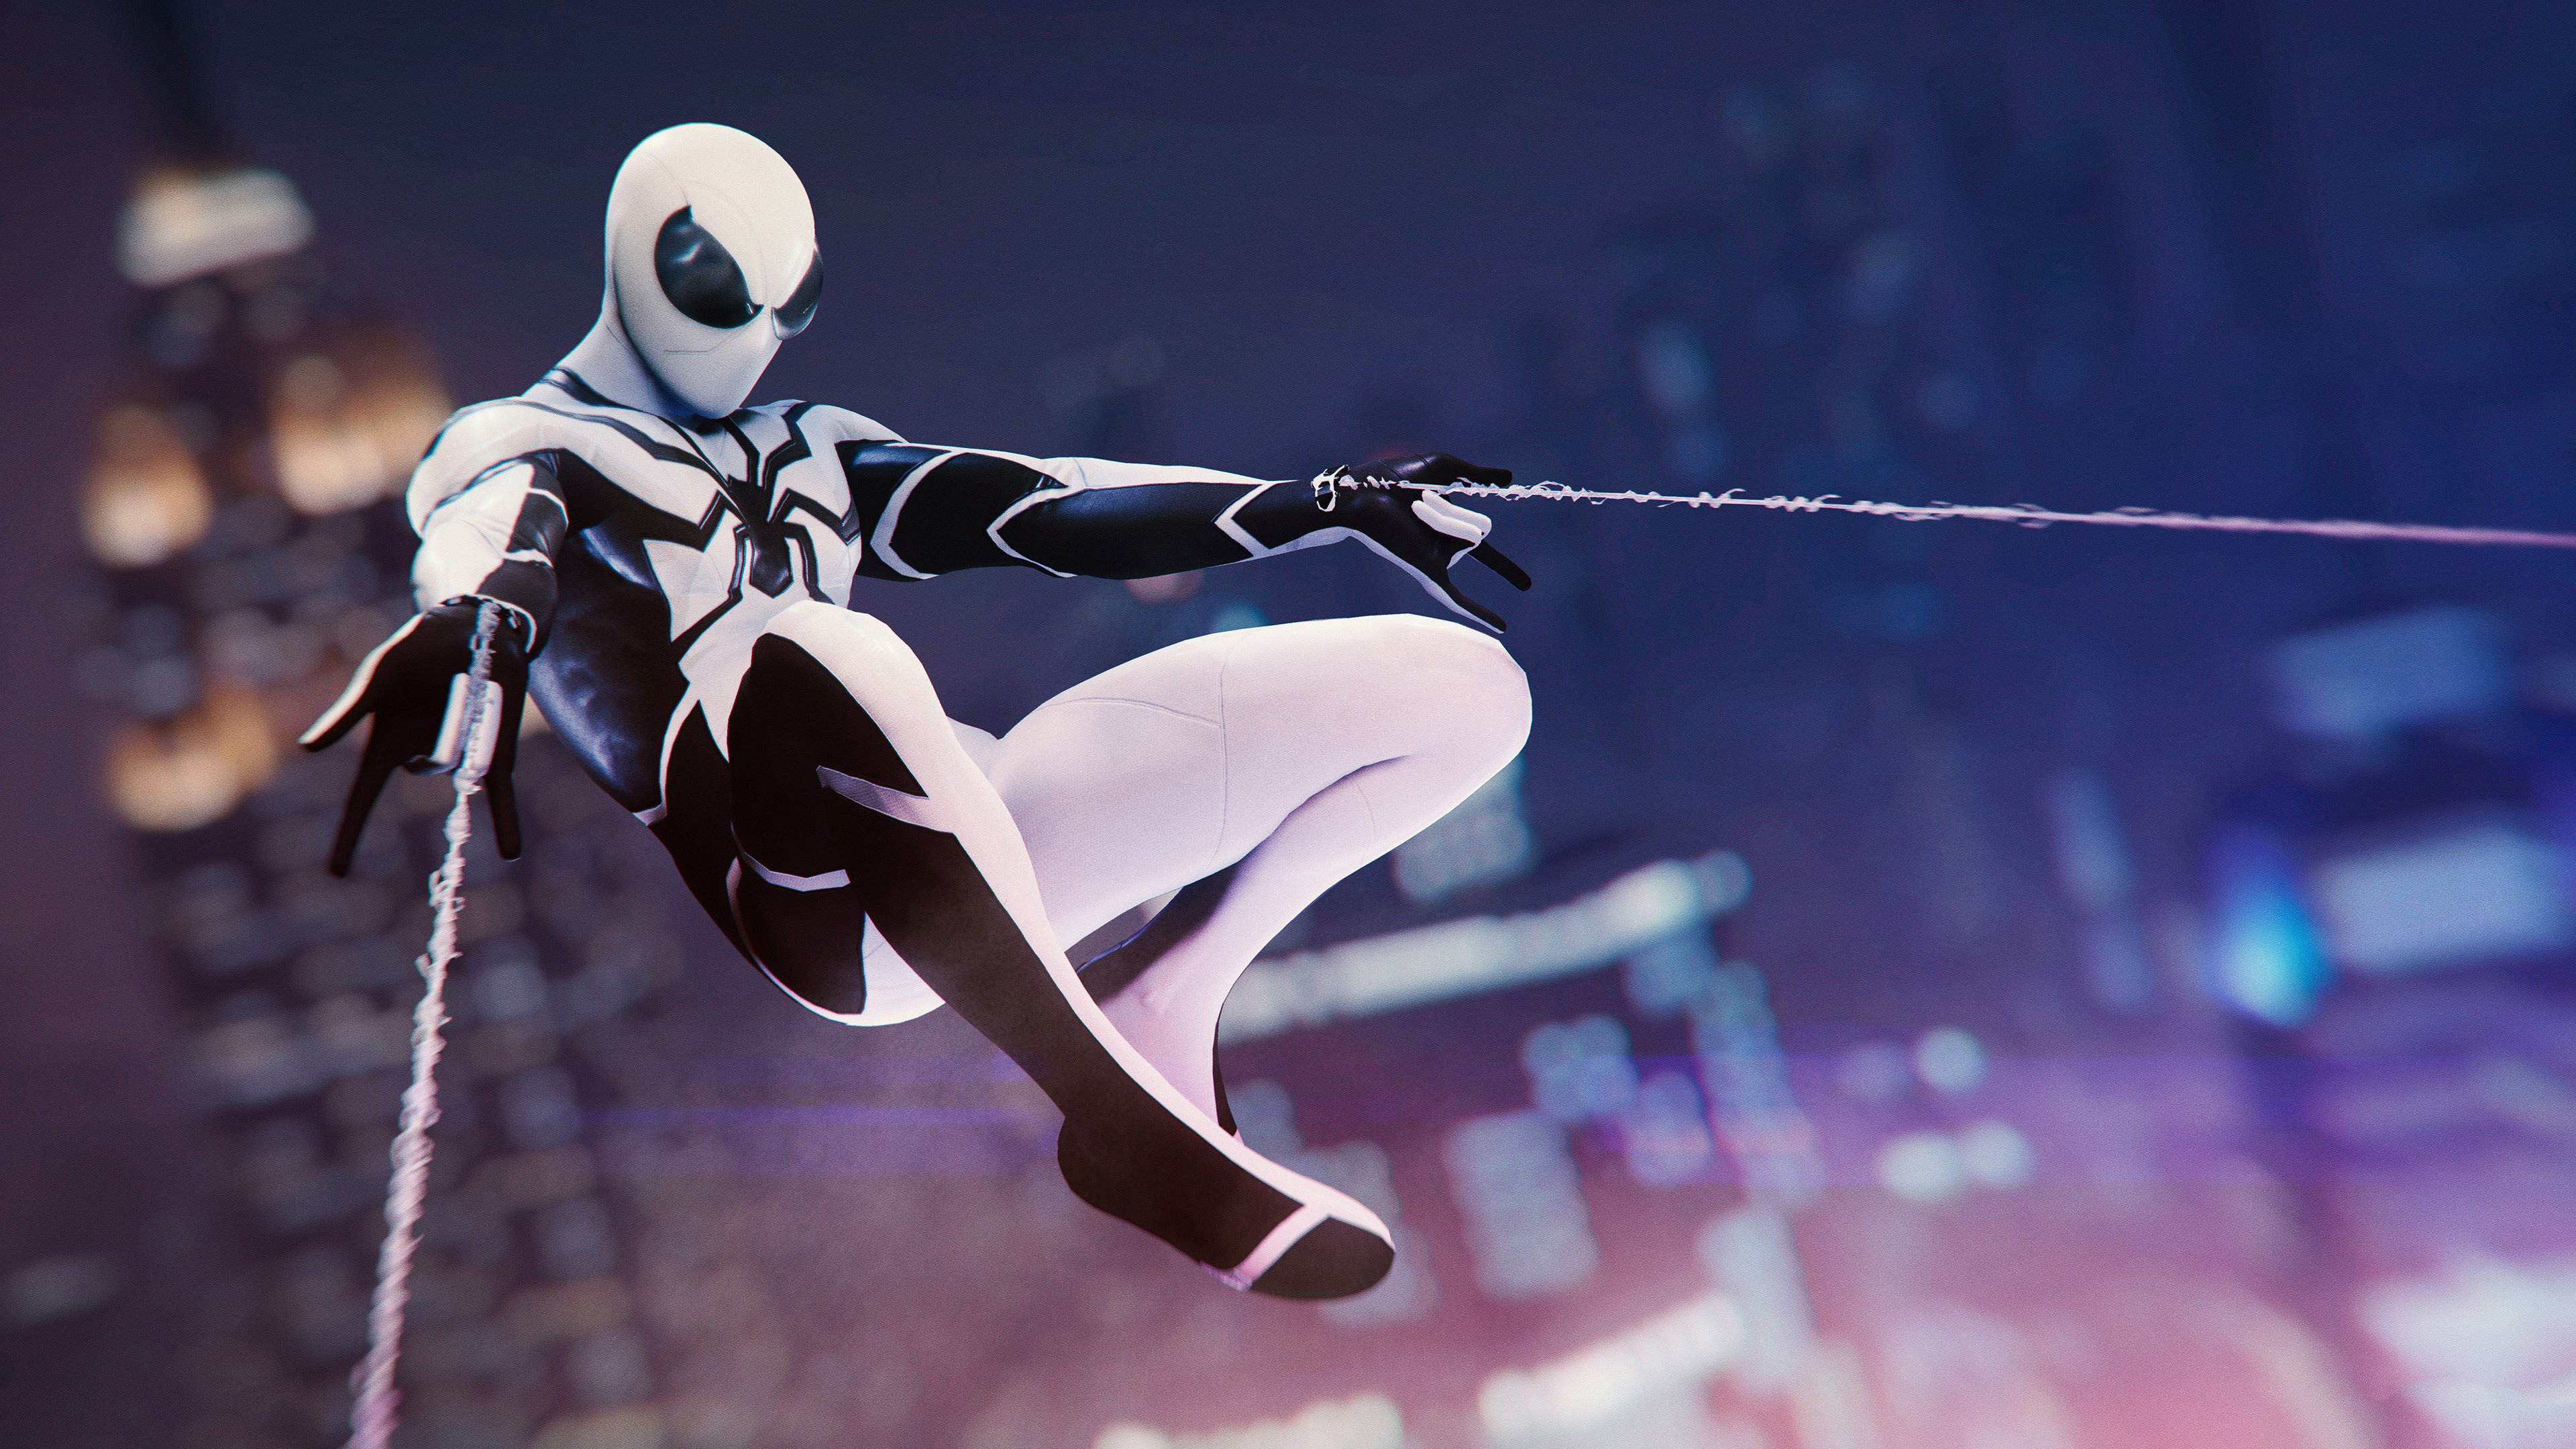 spiderman ps4 new suit 4k 1550510512 - Spiderman Ps4 New Suit 4k - spiderman wallpapers, spiderman ps4 wallpapers, ps games wallpapers, hd-wallpapers, games wallpapers, 4k-wallpapers, 2019 games wallpapers